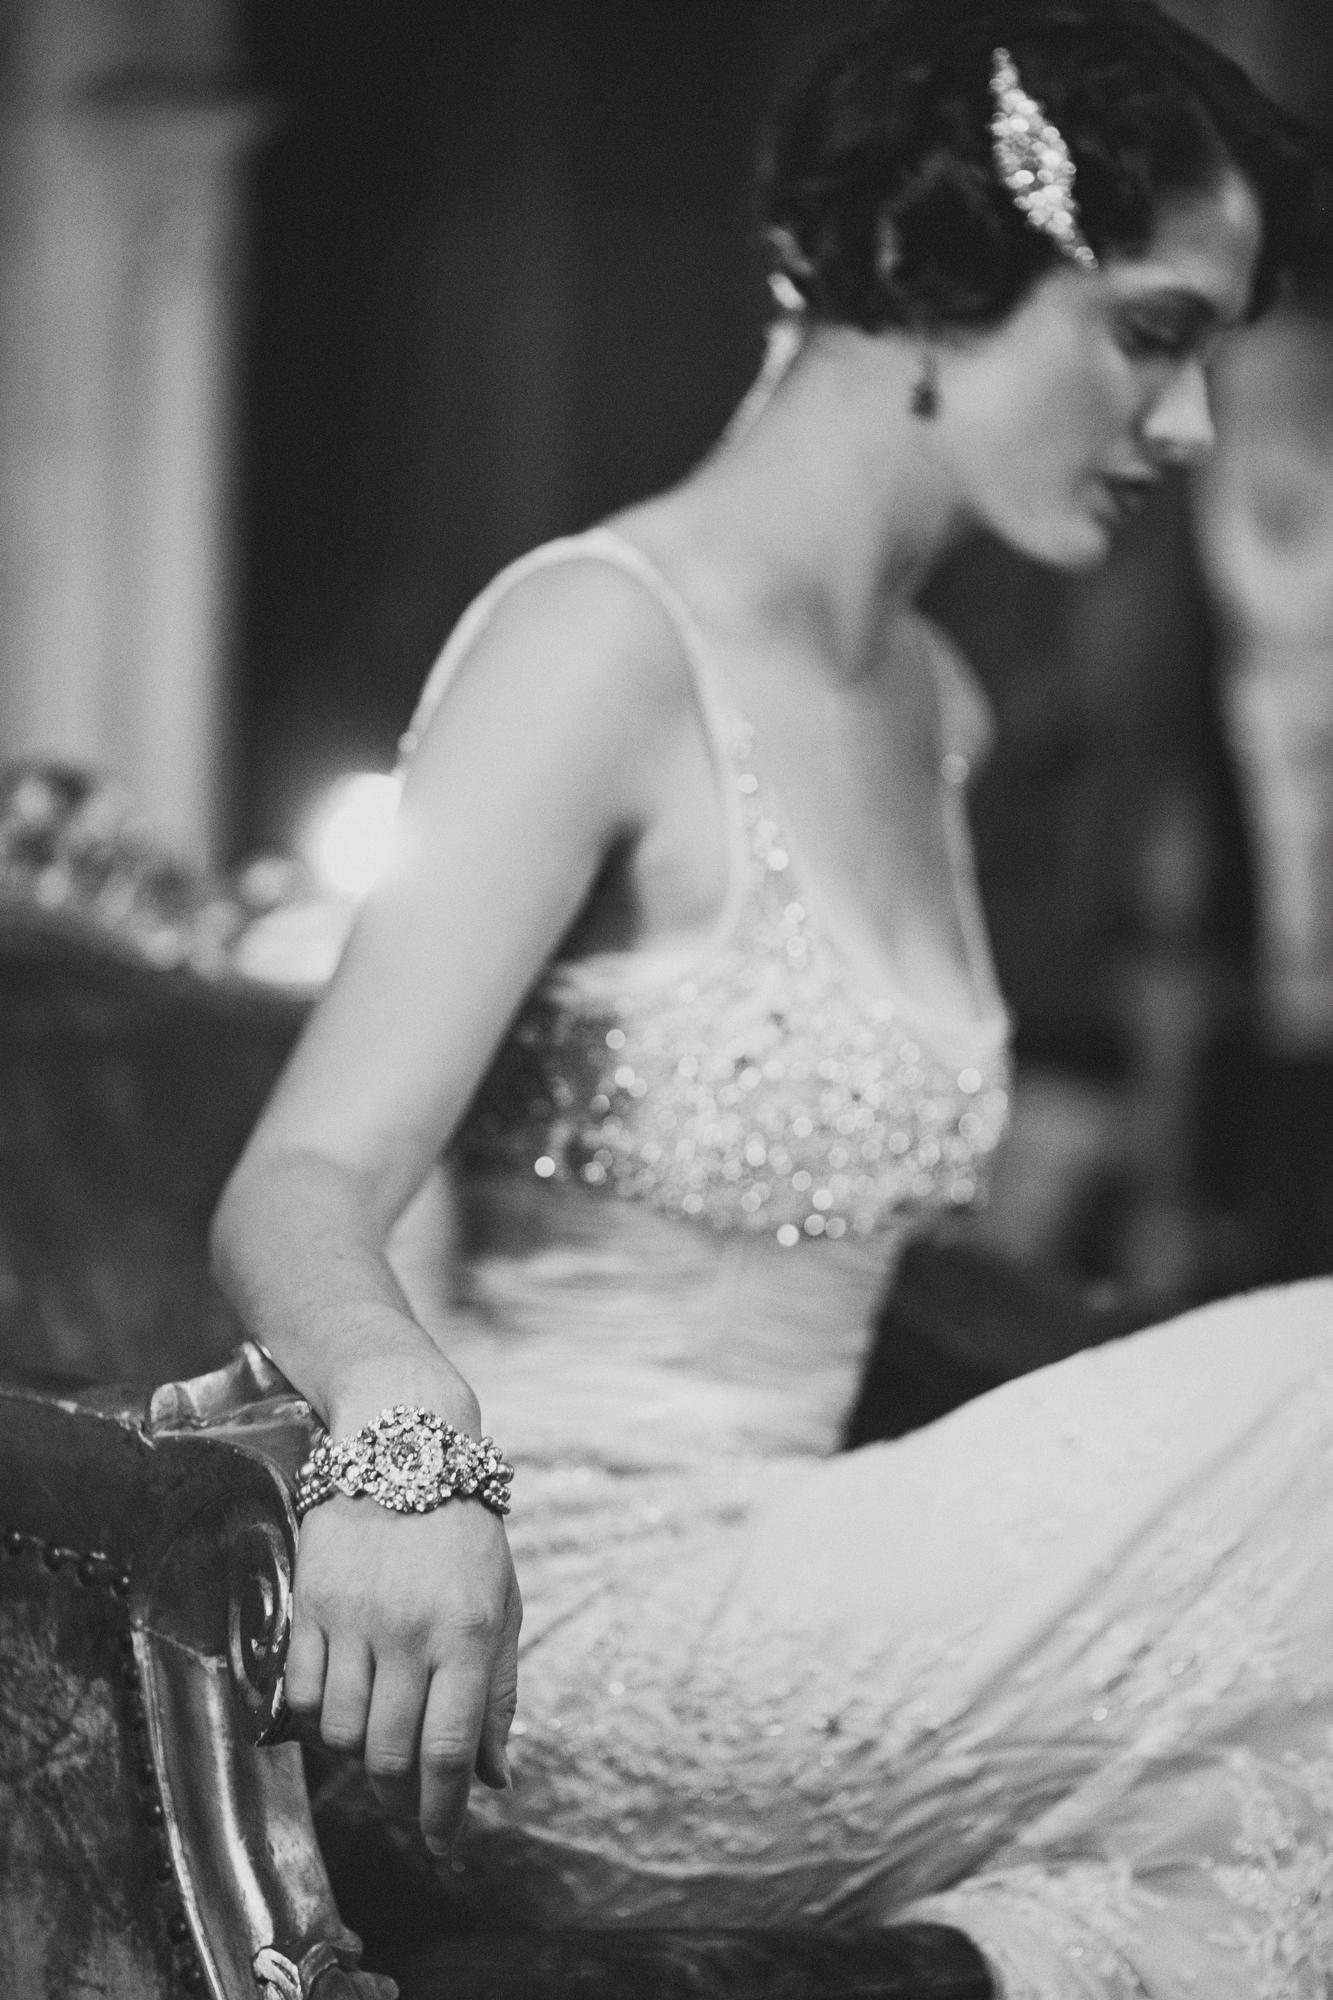 jennifer-skog-bridal-fashion-photographer-lifestyle-0020.jpg